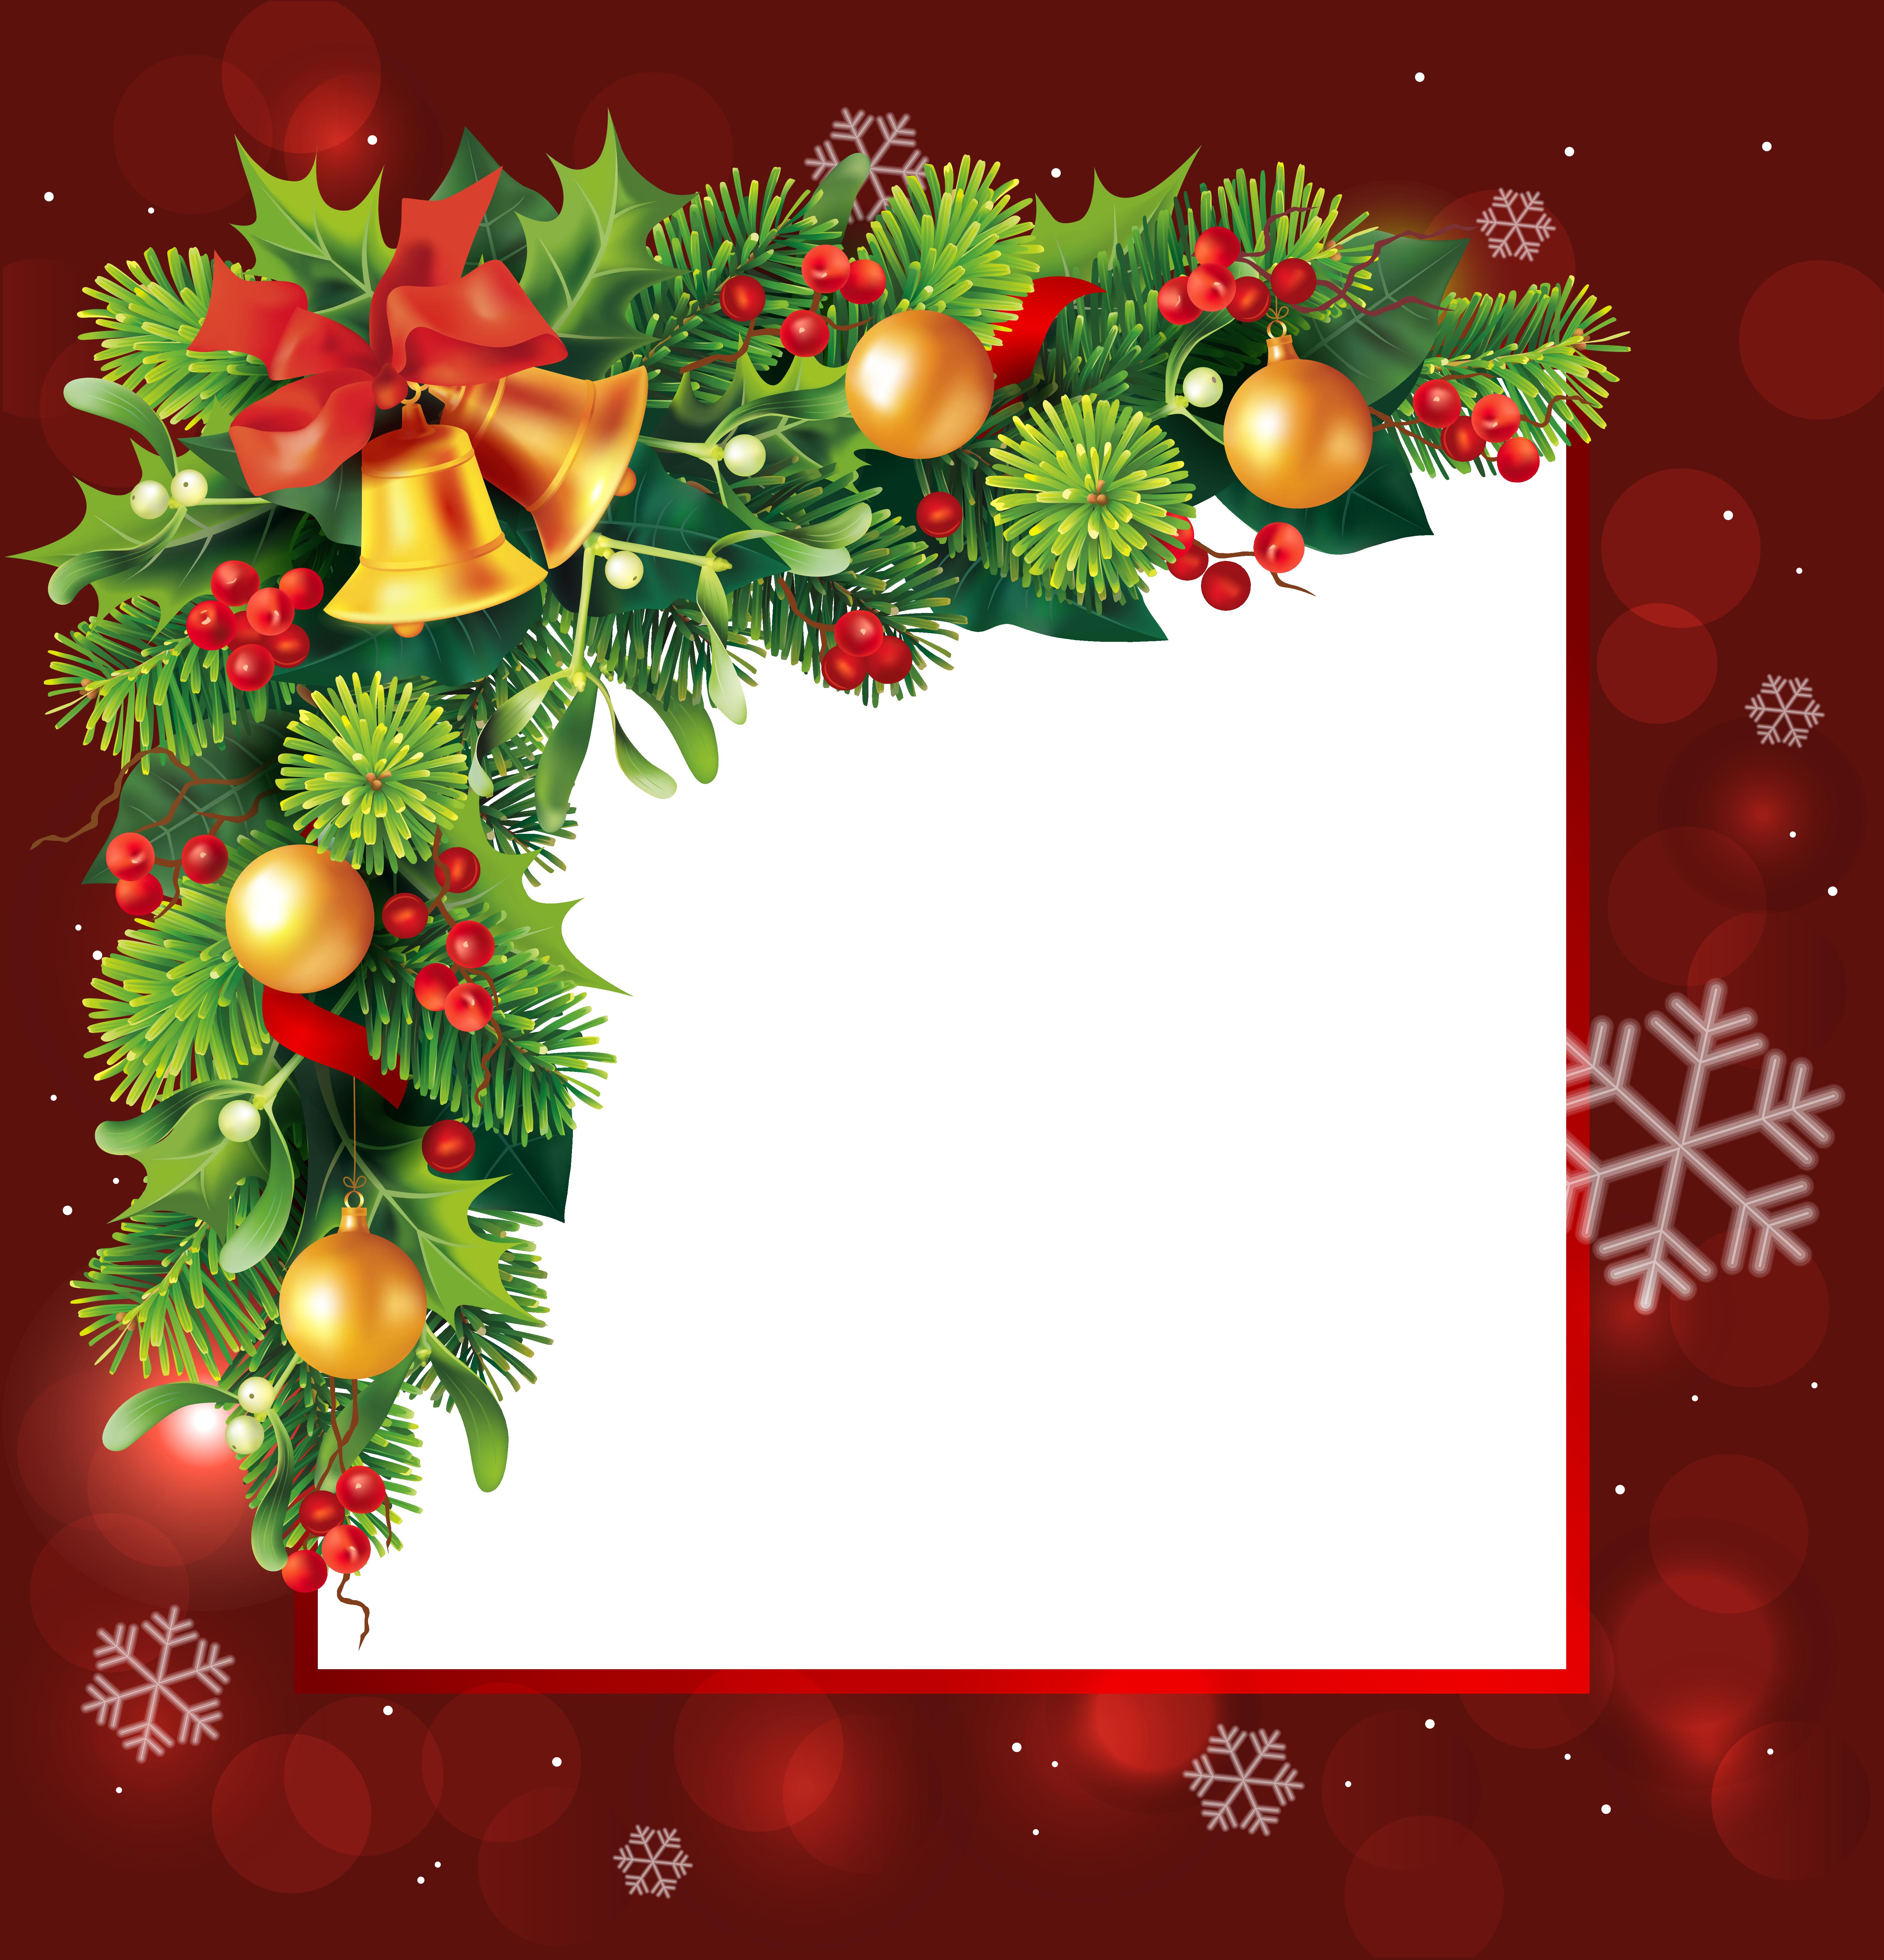 Christmas Transparent Frame Border Free Christmas Borders Christmas Border Christmas Photo Frame